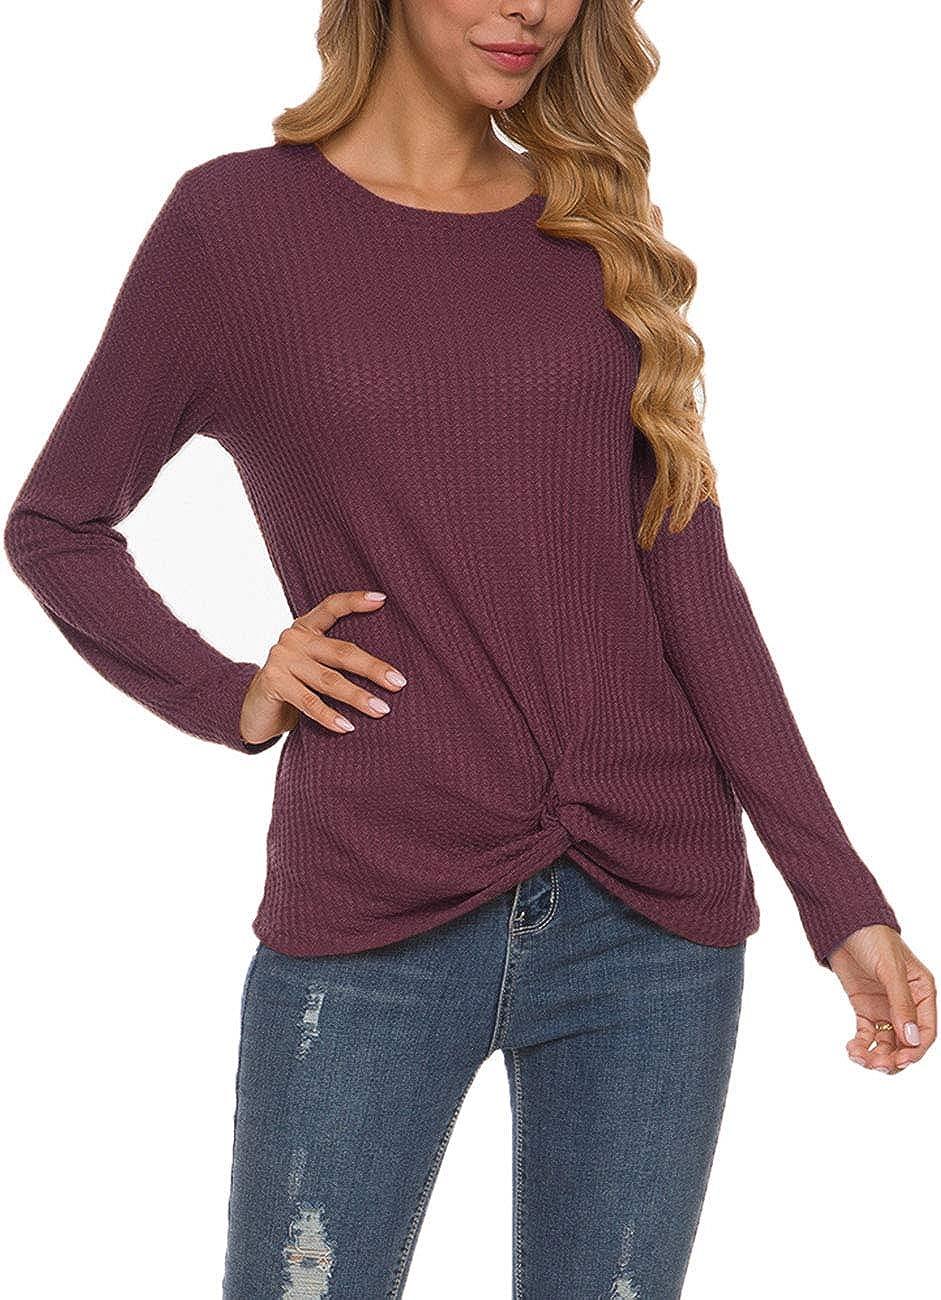 MISFAY Womens Casual Top Long Sleeve Cute Twist Knot Waffle Knit Shirts Tops